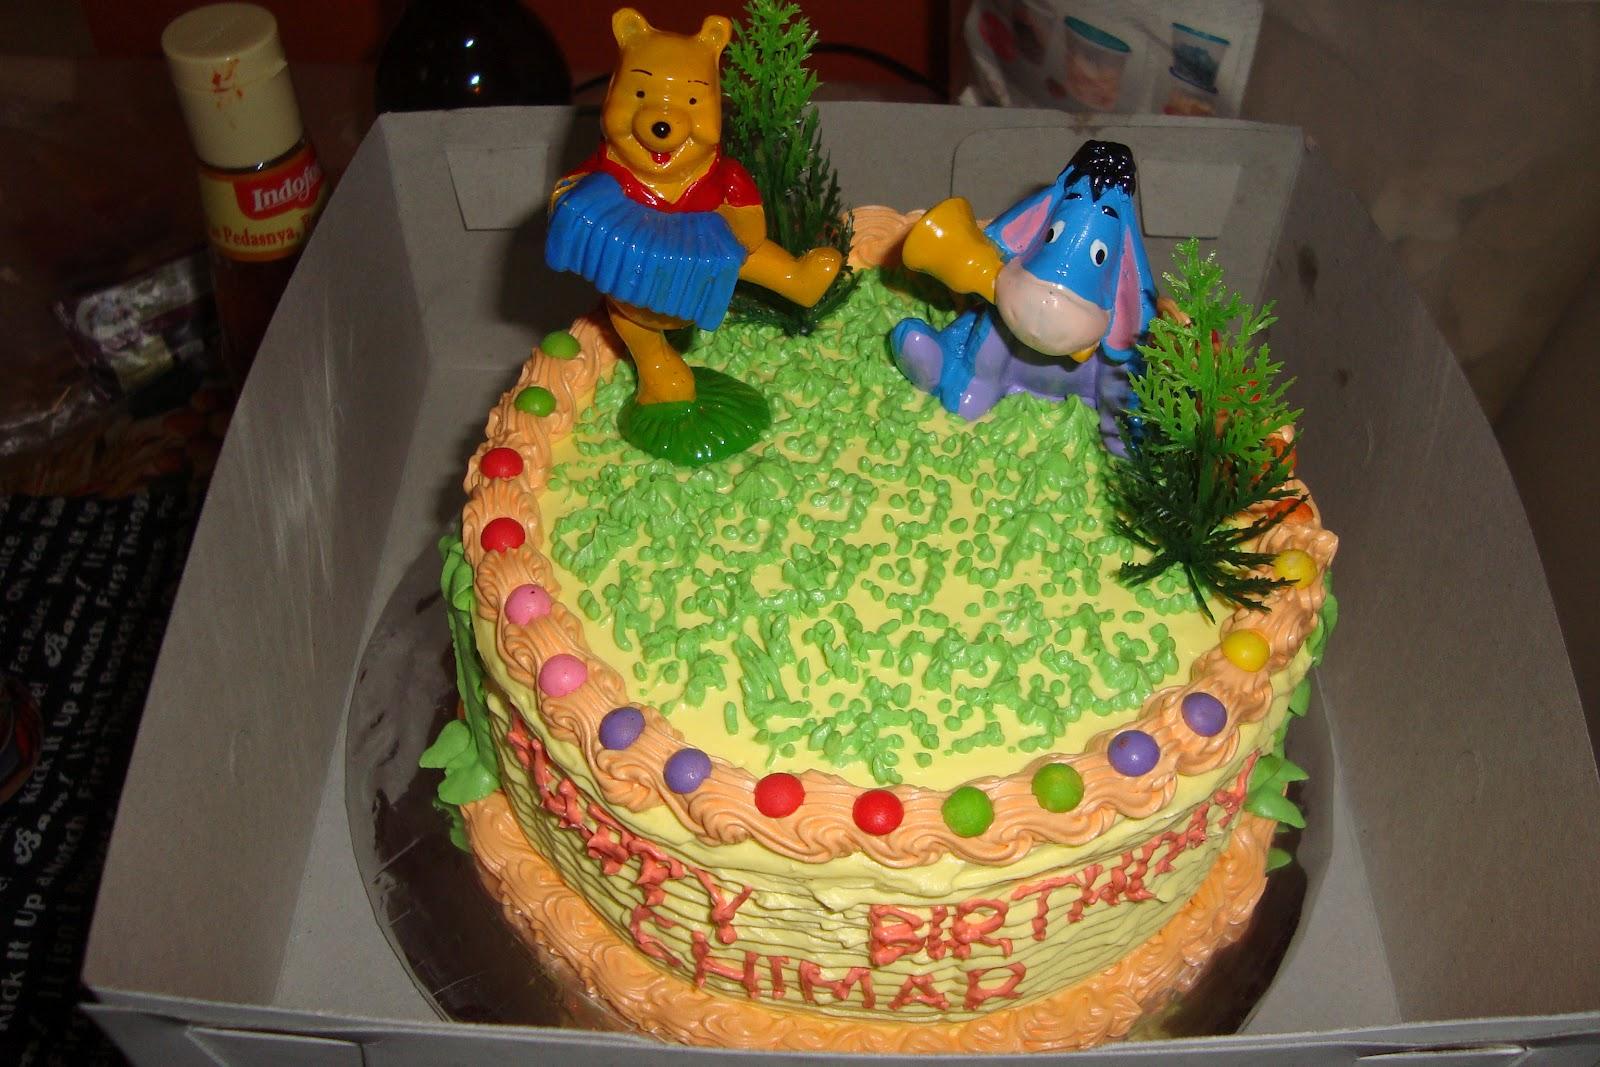 Imagechef Kue Ulang Tahun : Kithing Cake,Cookies & Chocolate: Koleksi Kue Ulang Tahun